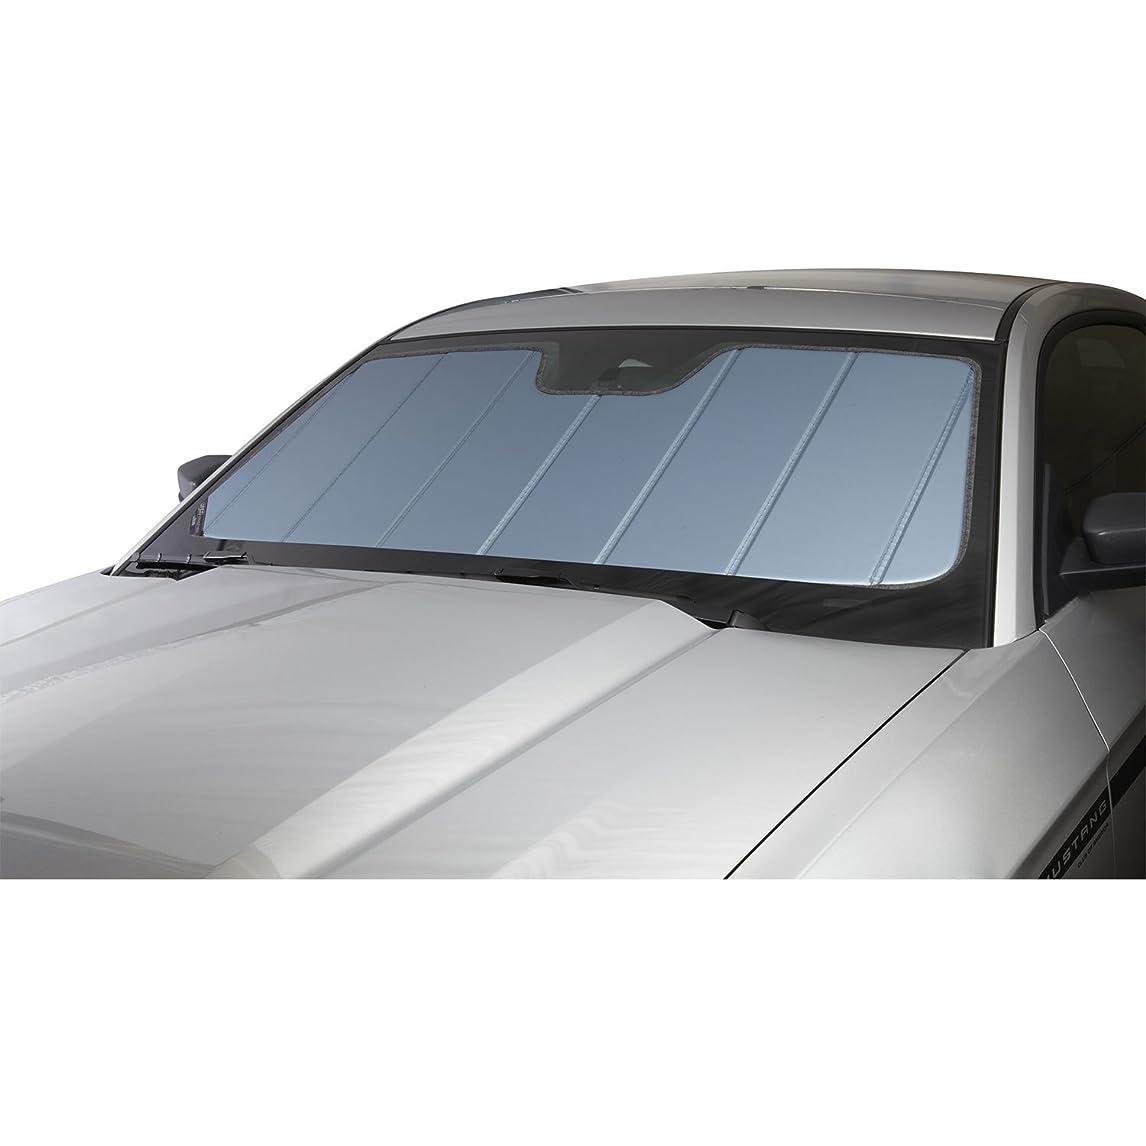 Covercraft UV10939BL Blue Metallic UVS 100 Custom Fit Sunscreen for Select Cadillac STS Models - Laminate Material, 1 Pack zgwxb27986671313